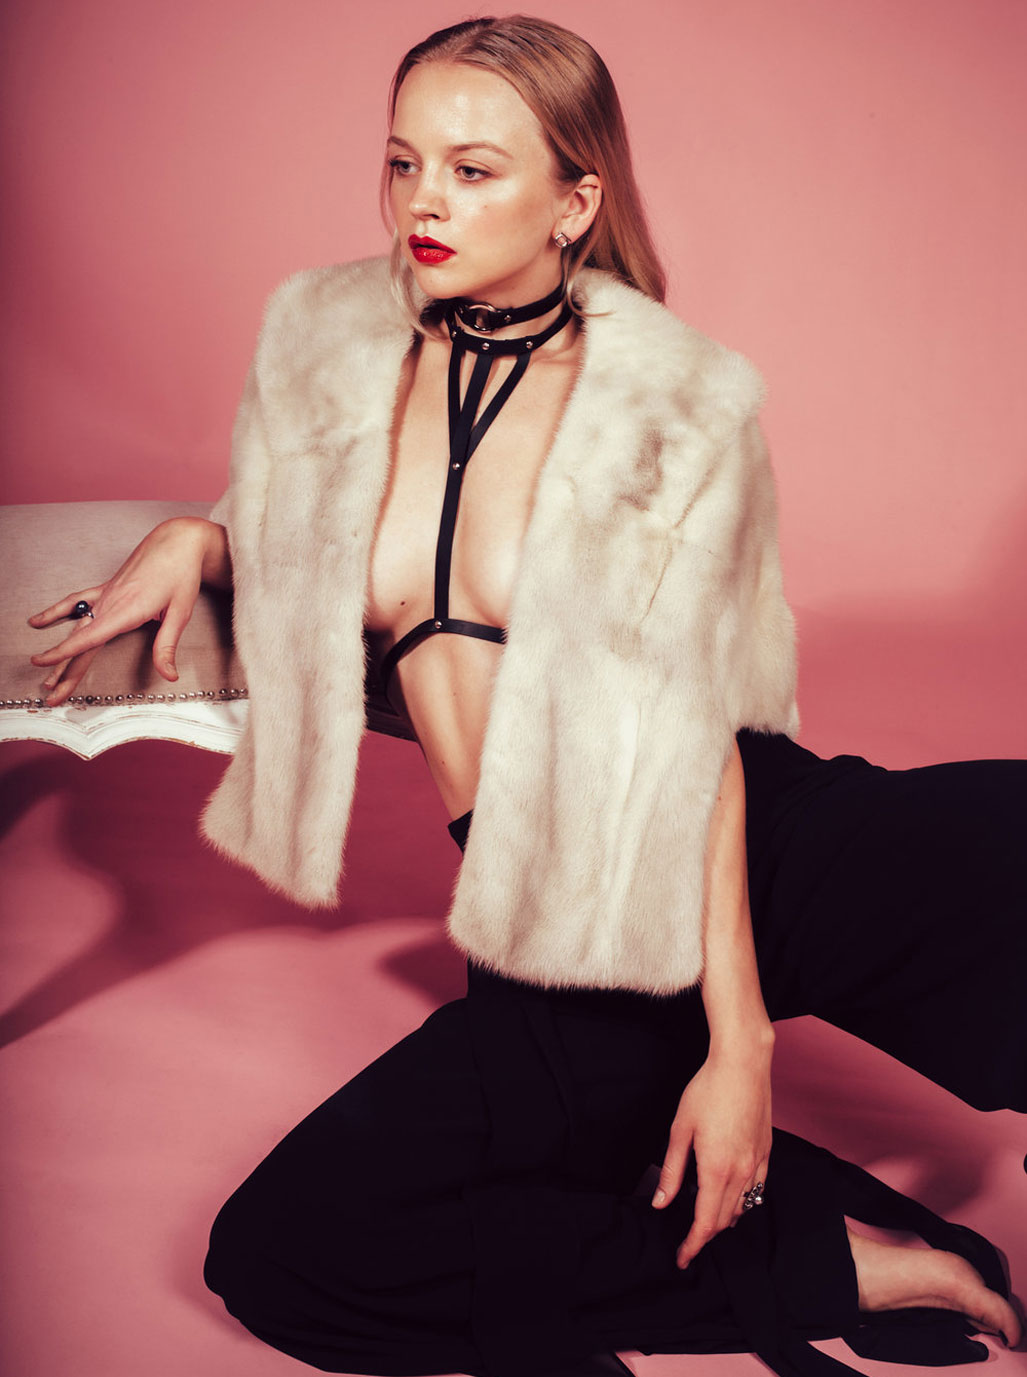 Светлана Легун в рекламной кампании Wicca collection 2016 / фото 12